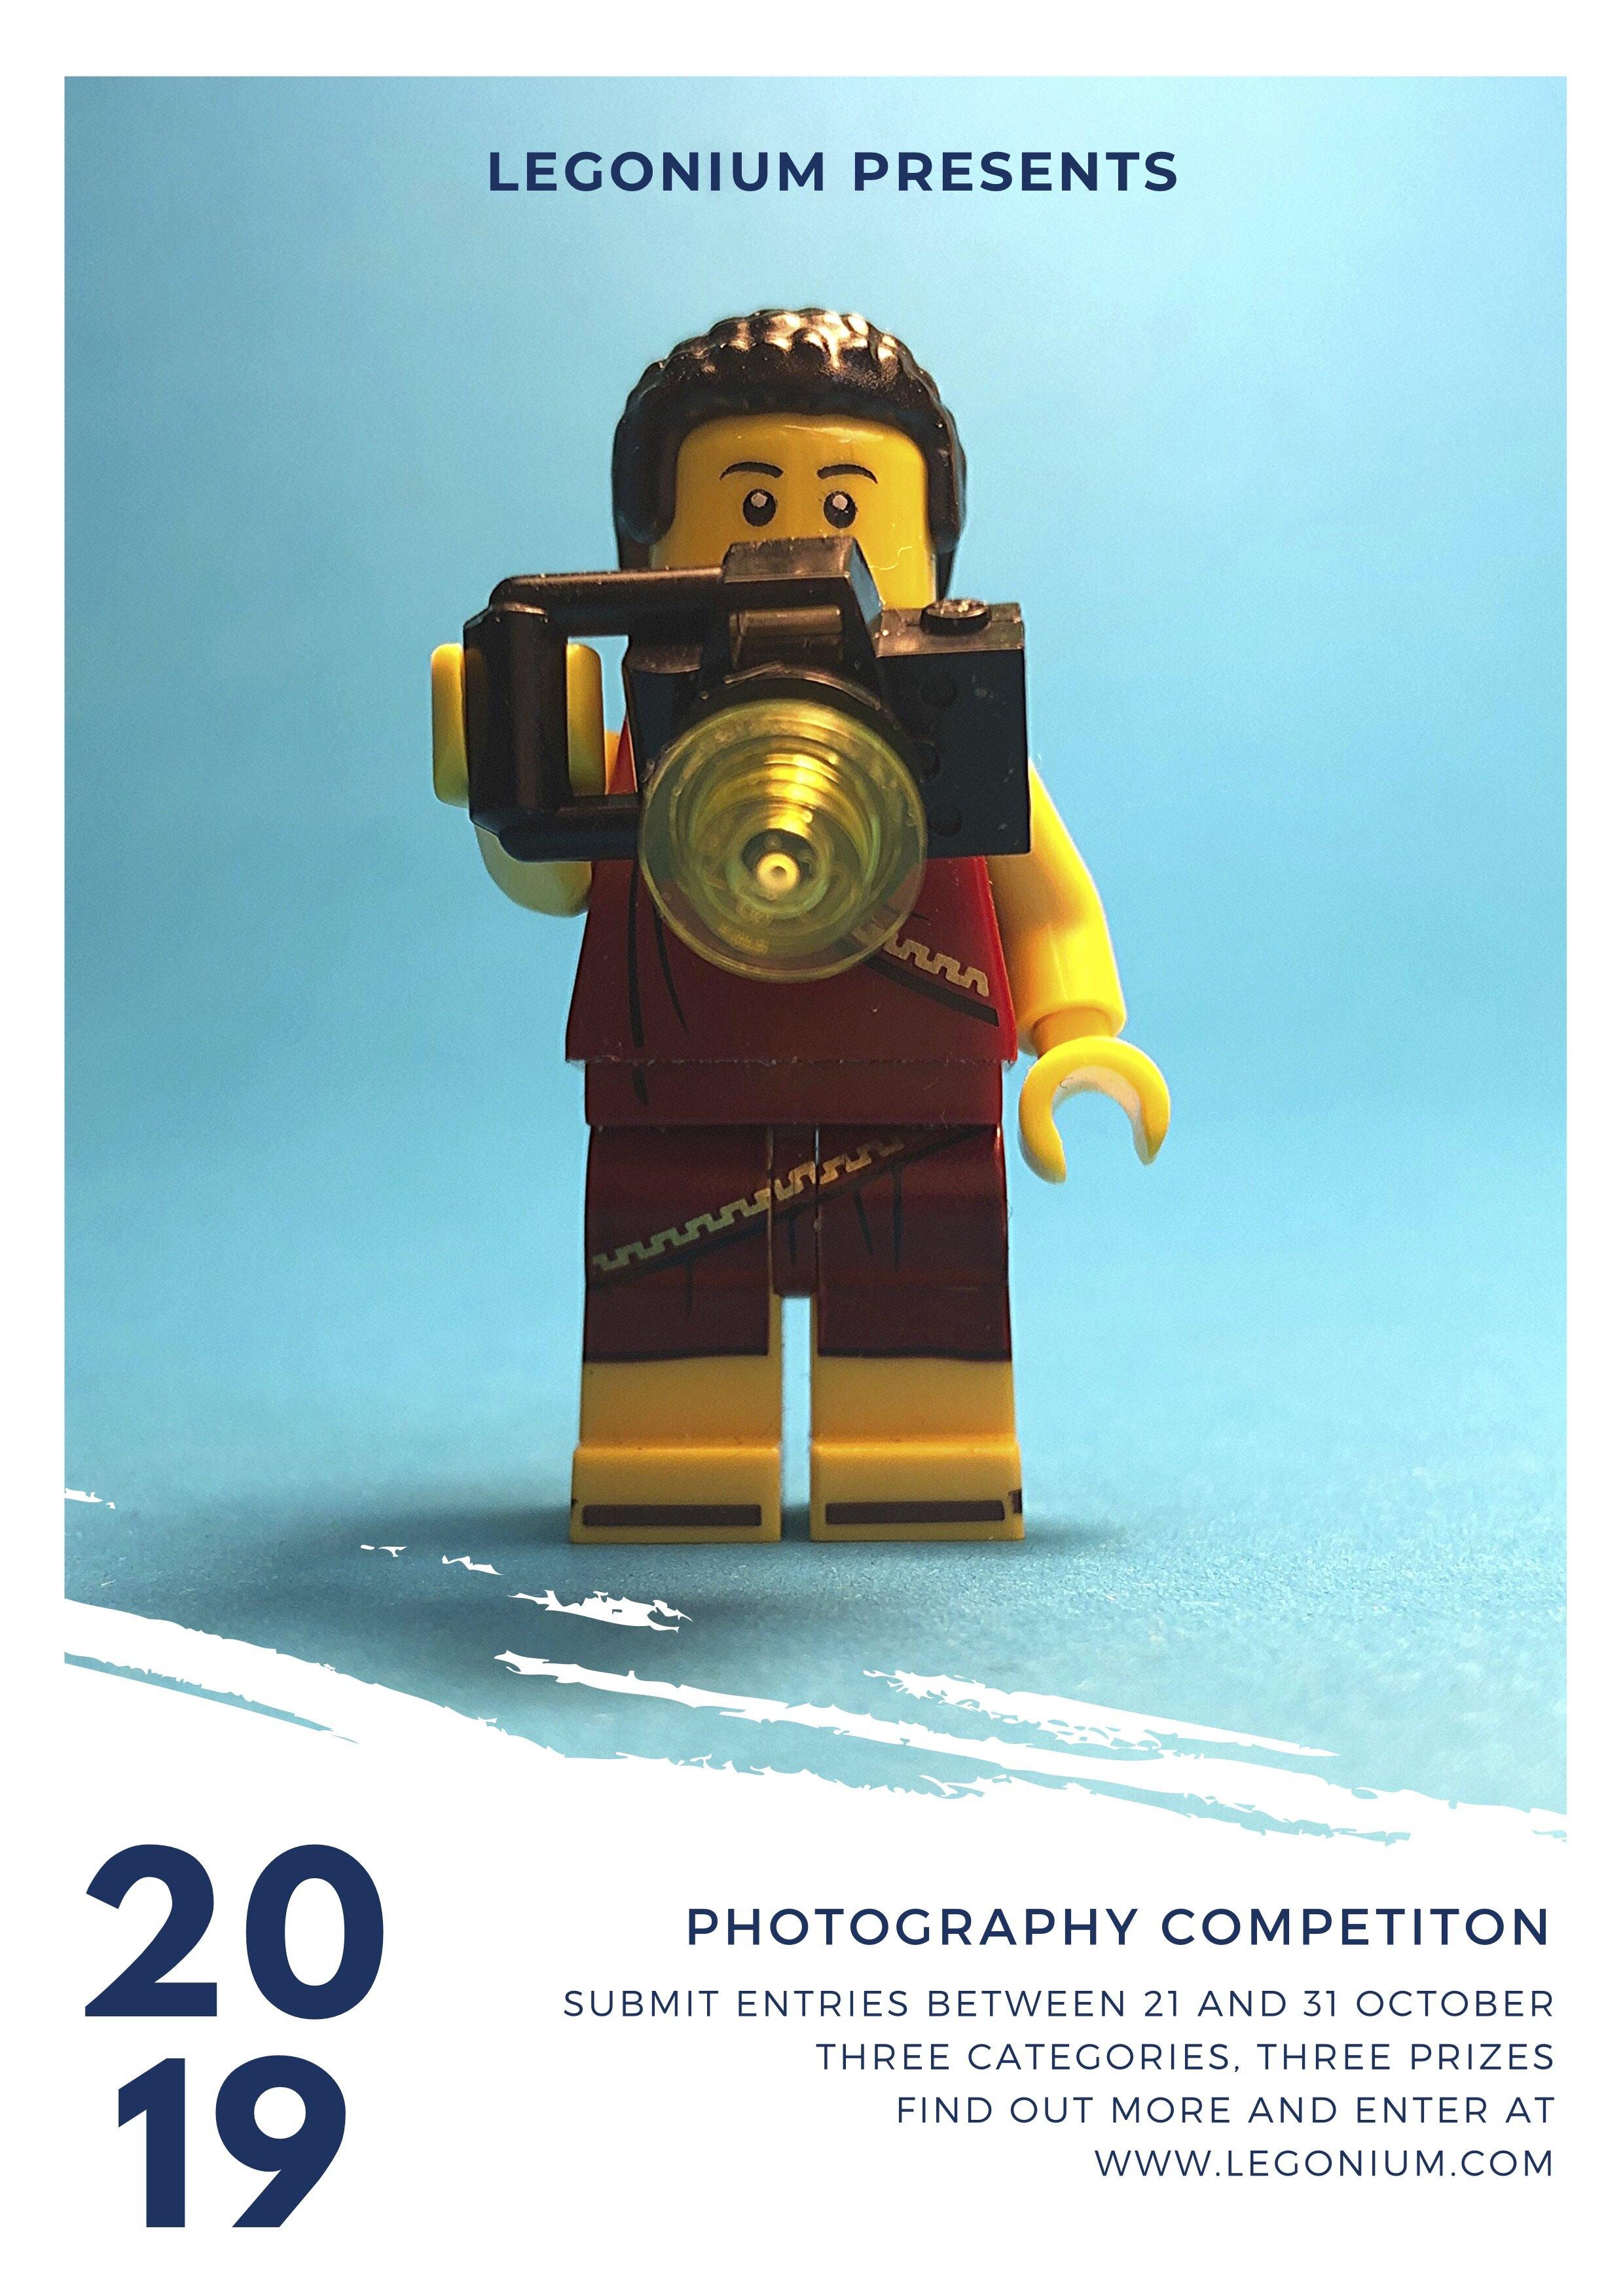 Legonium Photo Comp Poster.jpg